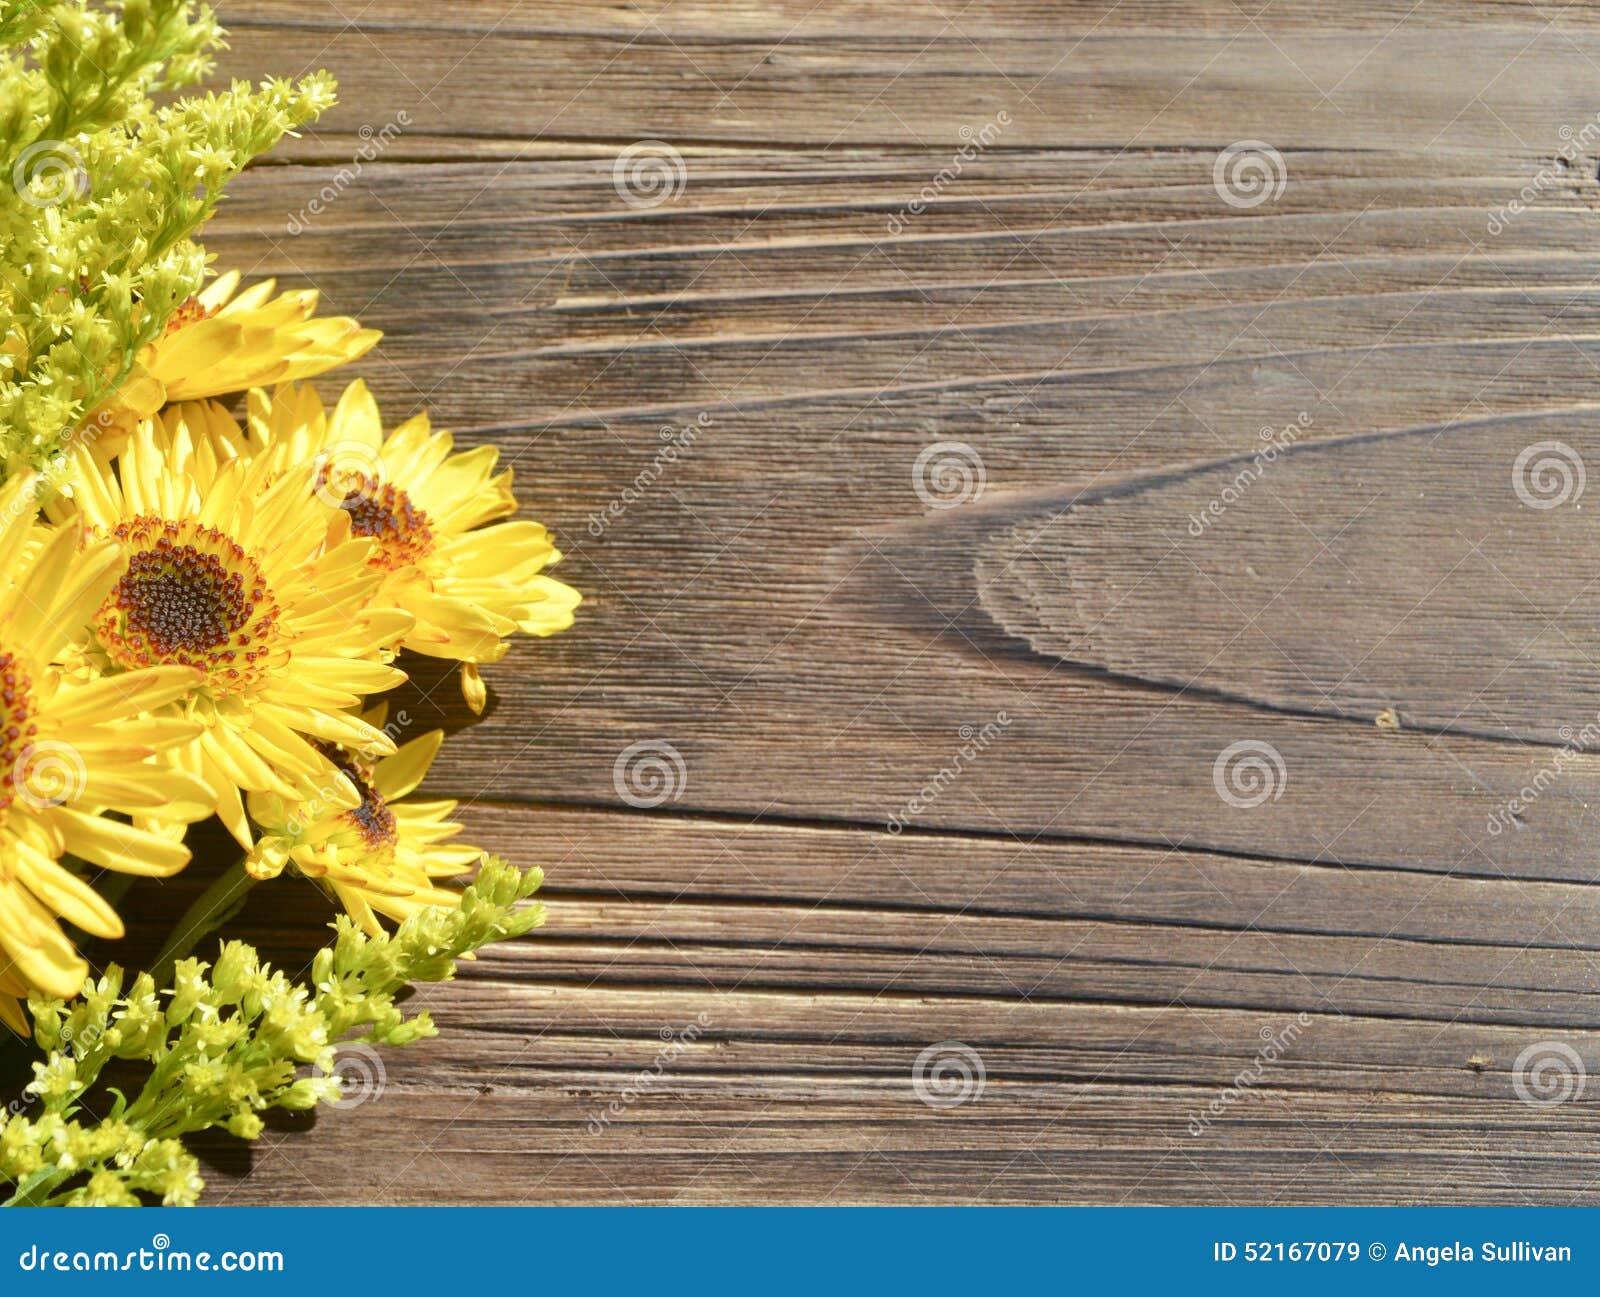 Yellow Daisies Wood Background Stock Photo